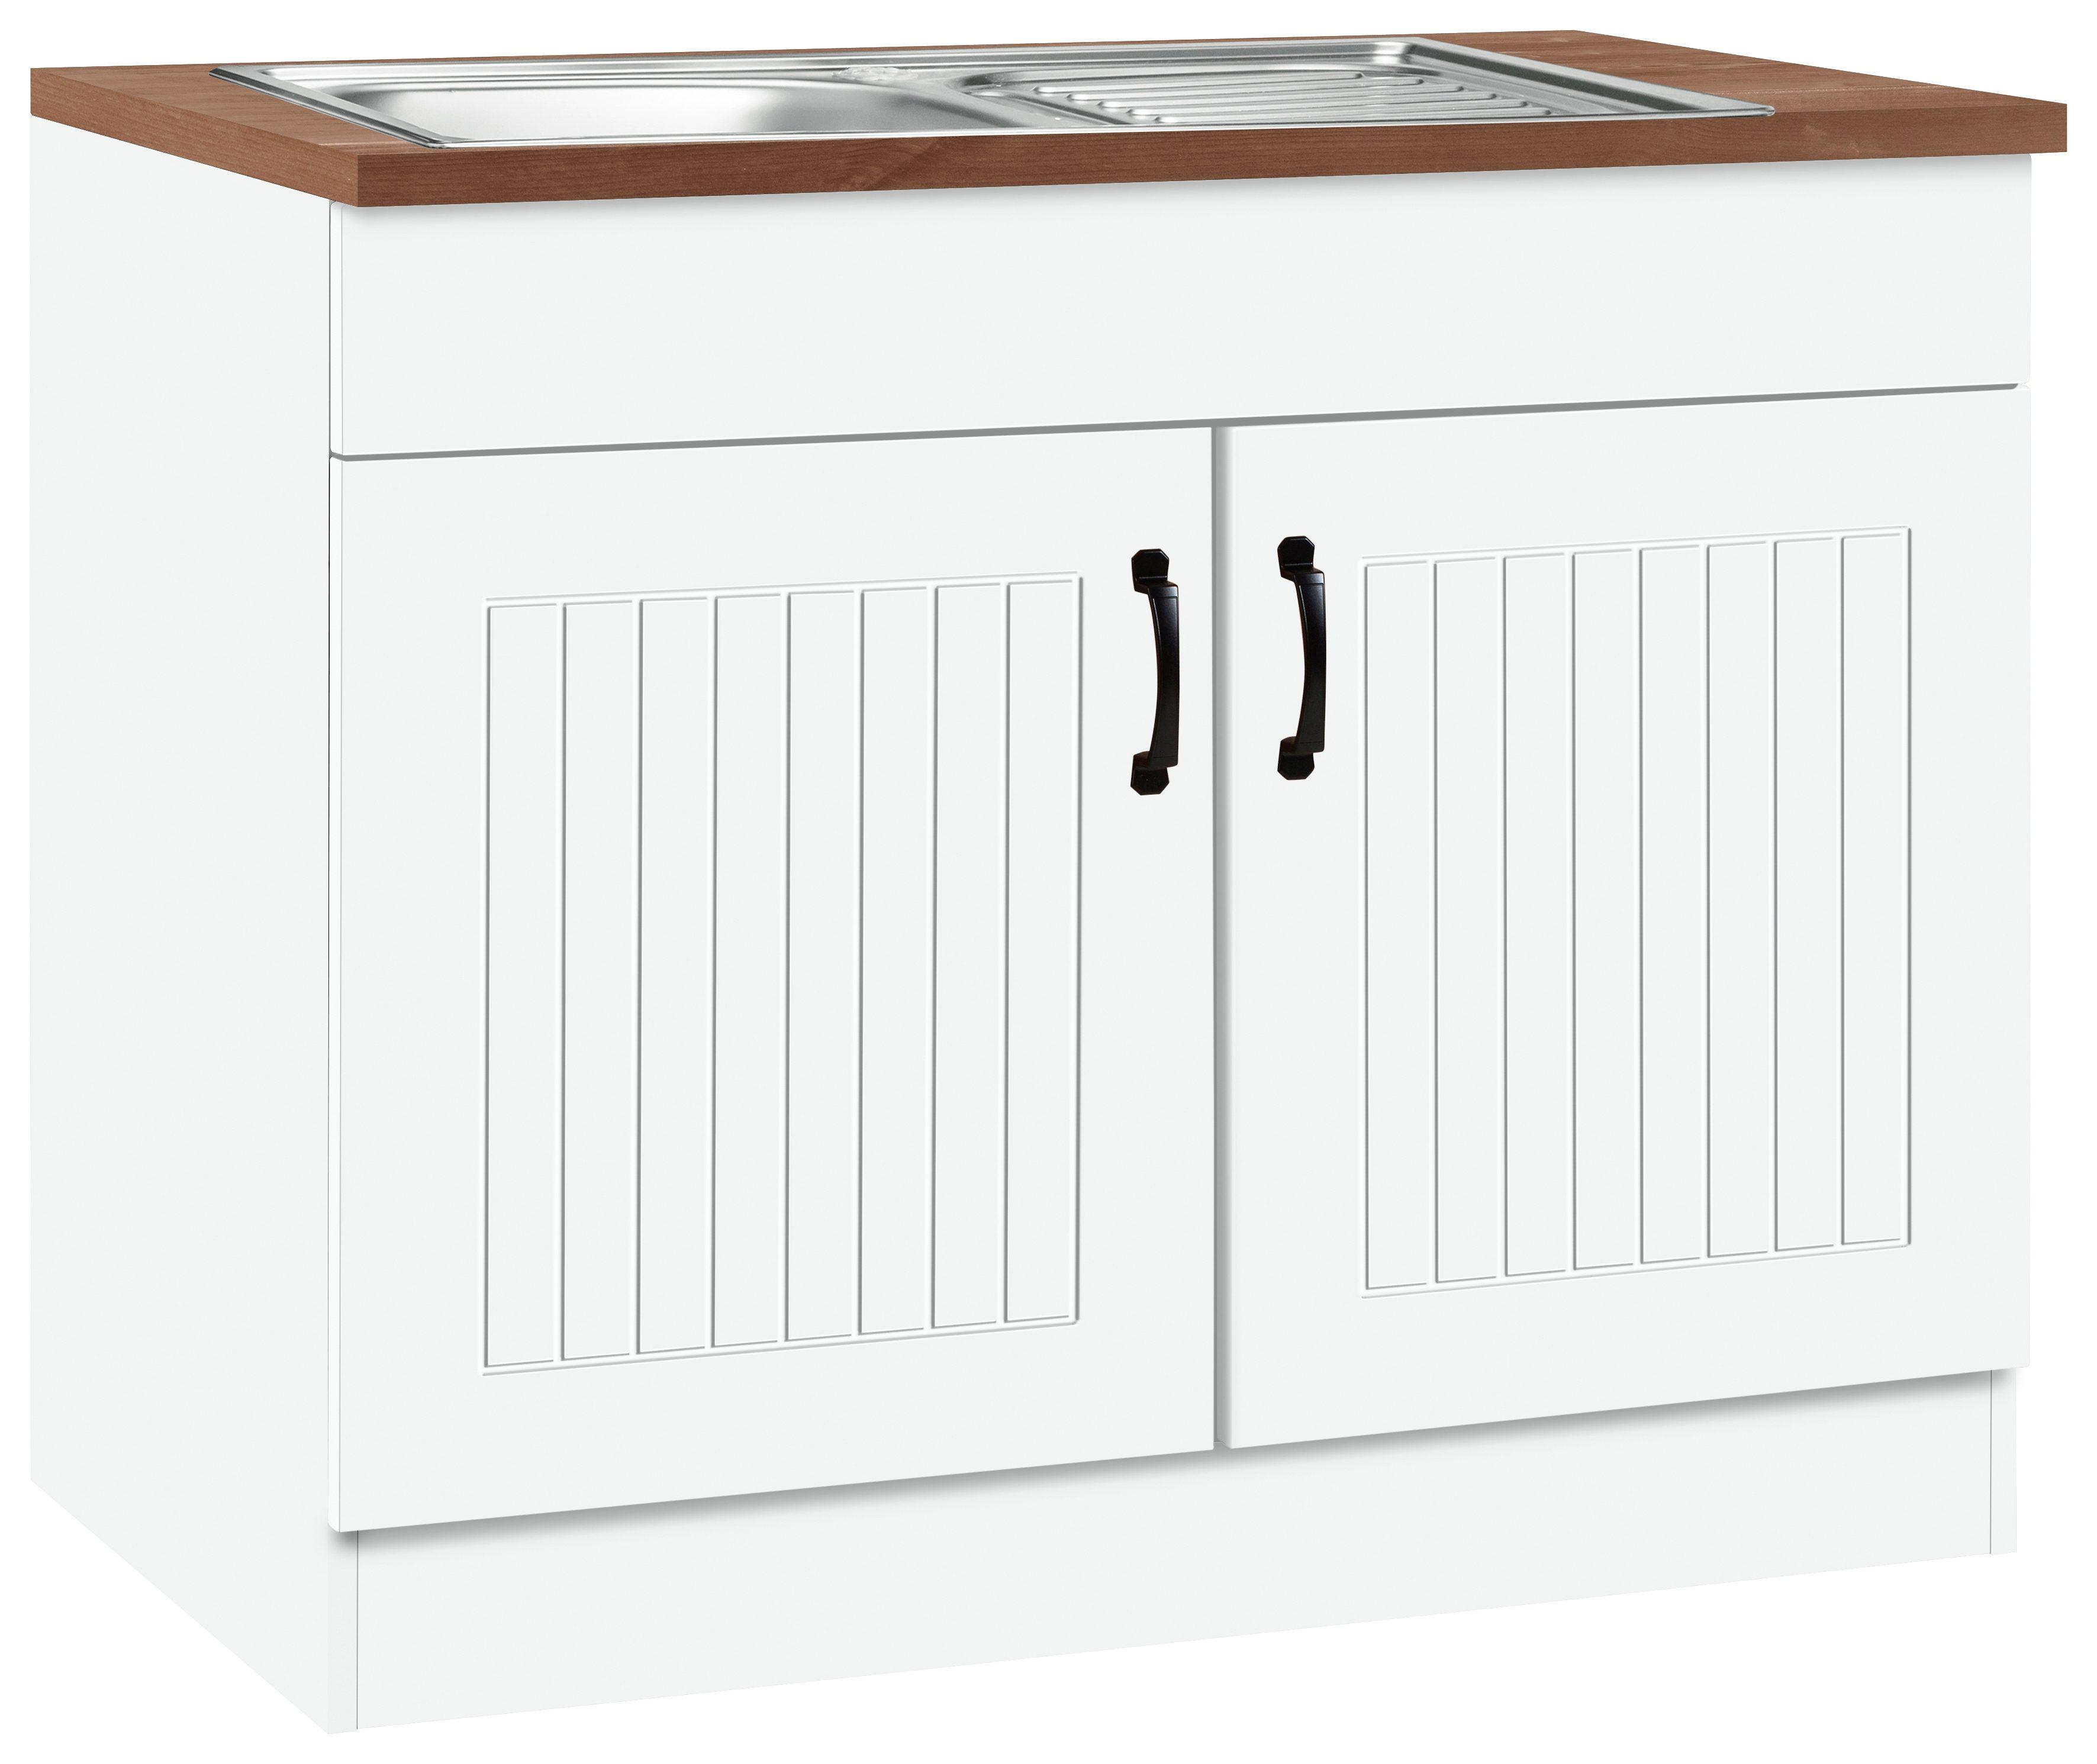 sp lenschrank held m bel athen online kaufen otto. Black Bedroom Furniture Sets. Home Design Ideas